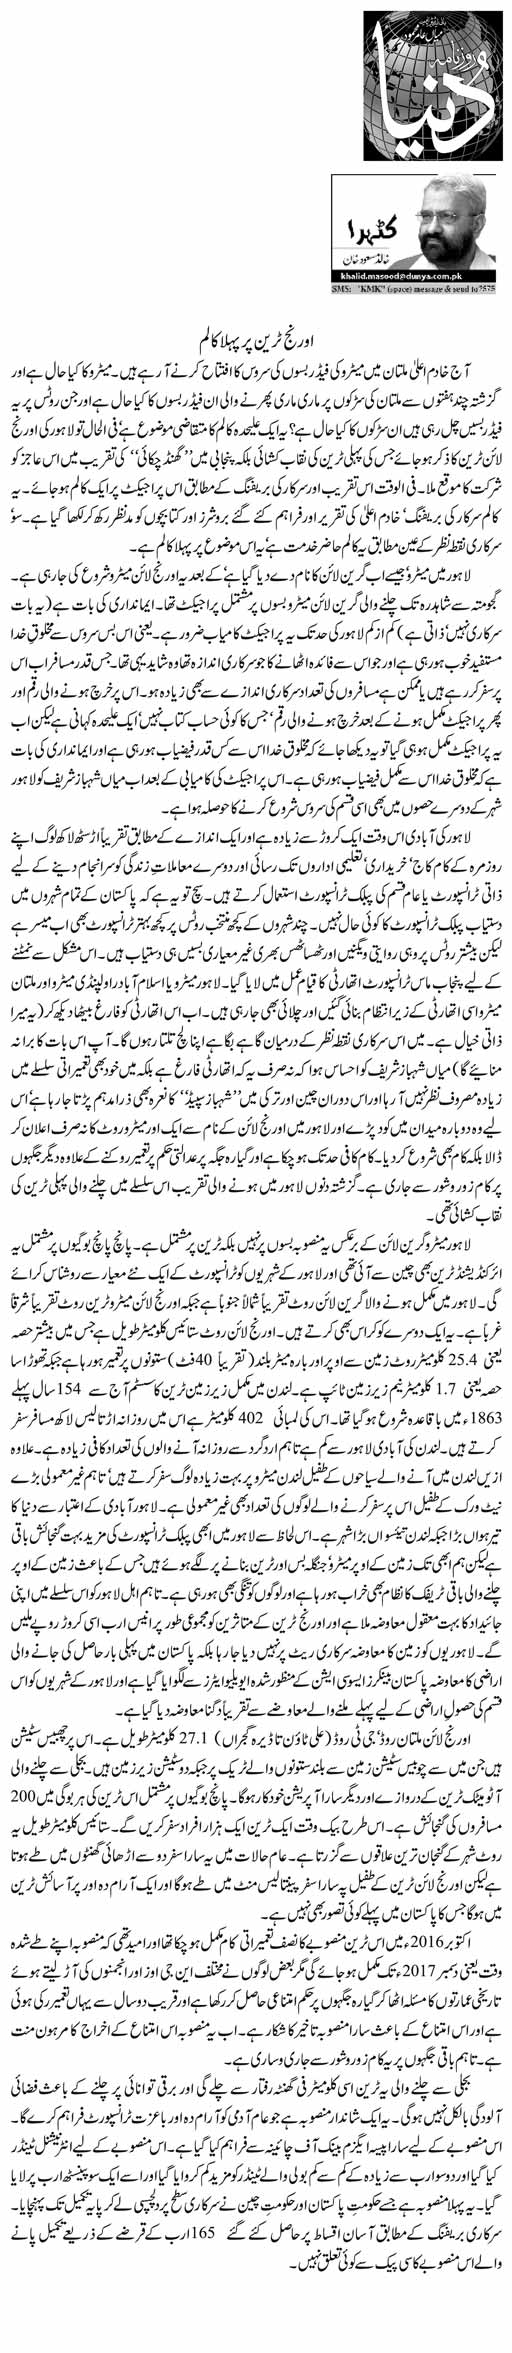 Orange Train Per Pehla Column | Khalid Masood Khan | Daily Urdu Columns